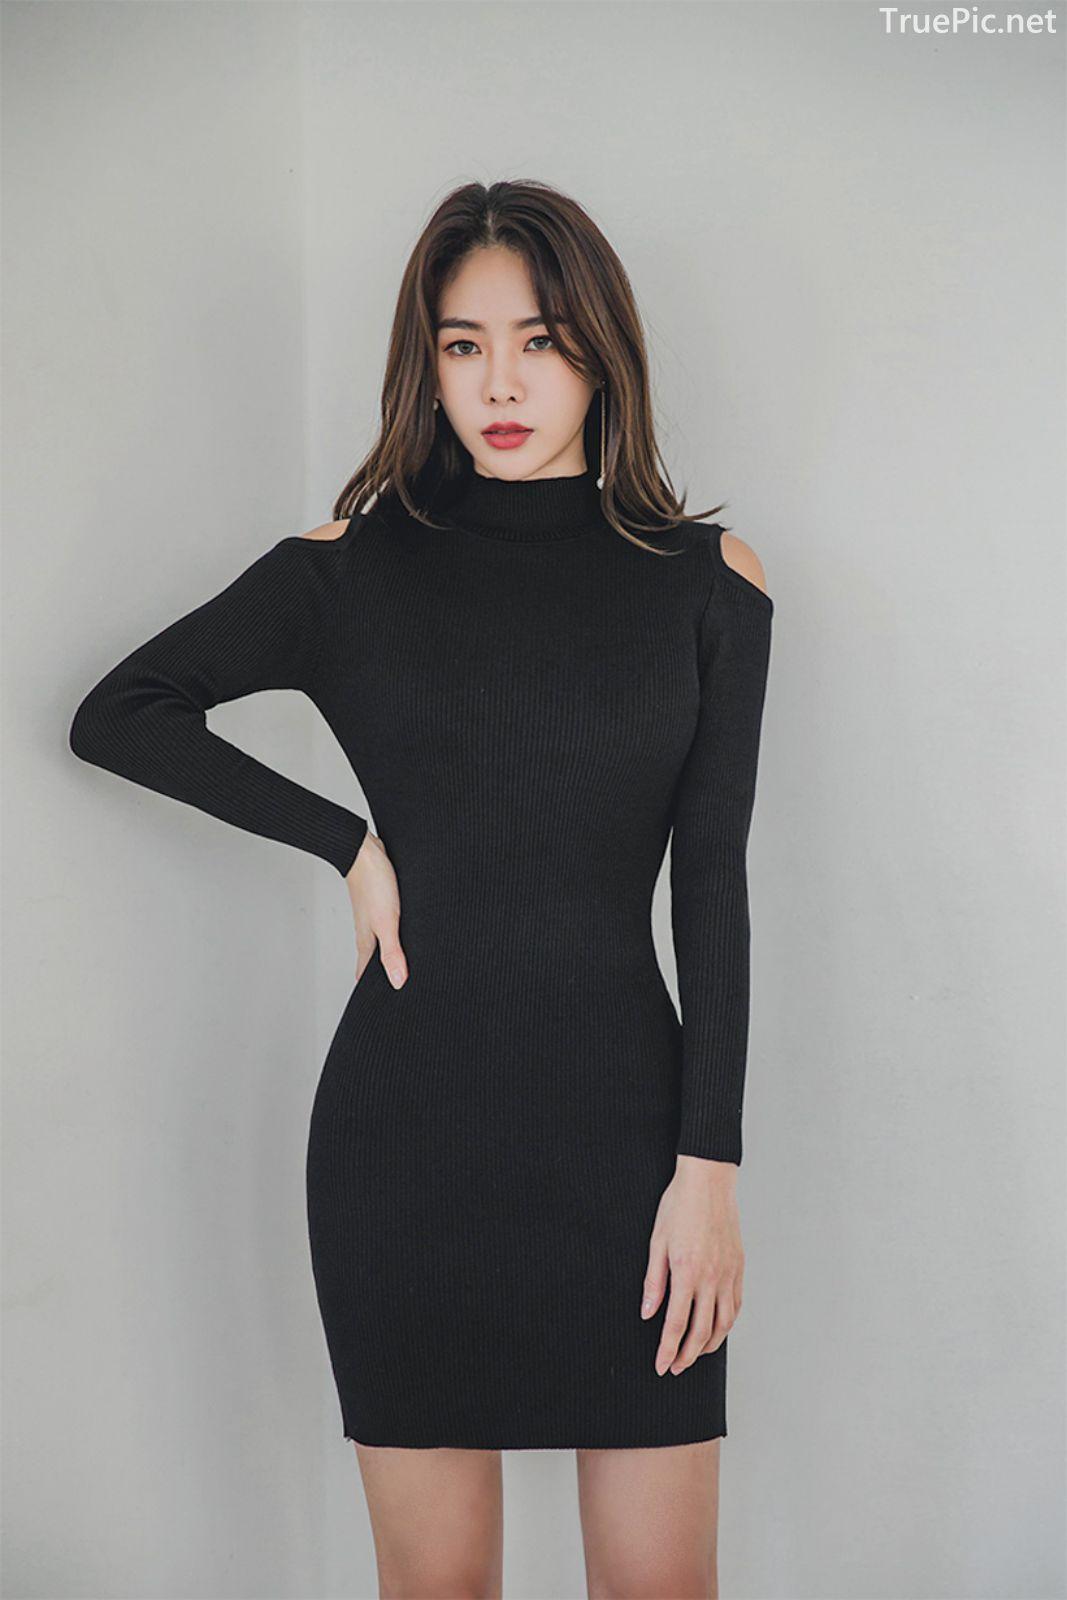 Korean fashion model - An Seo Rin - Woolen office dress collection - TruePic.net - Picture 6